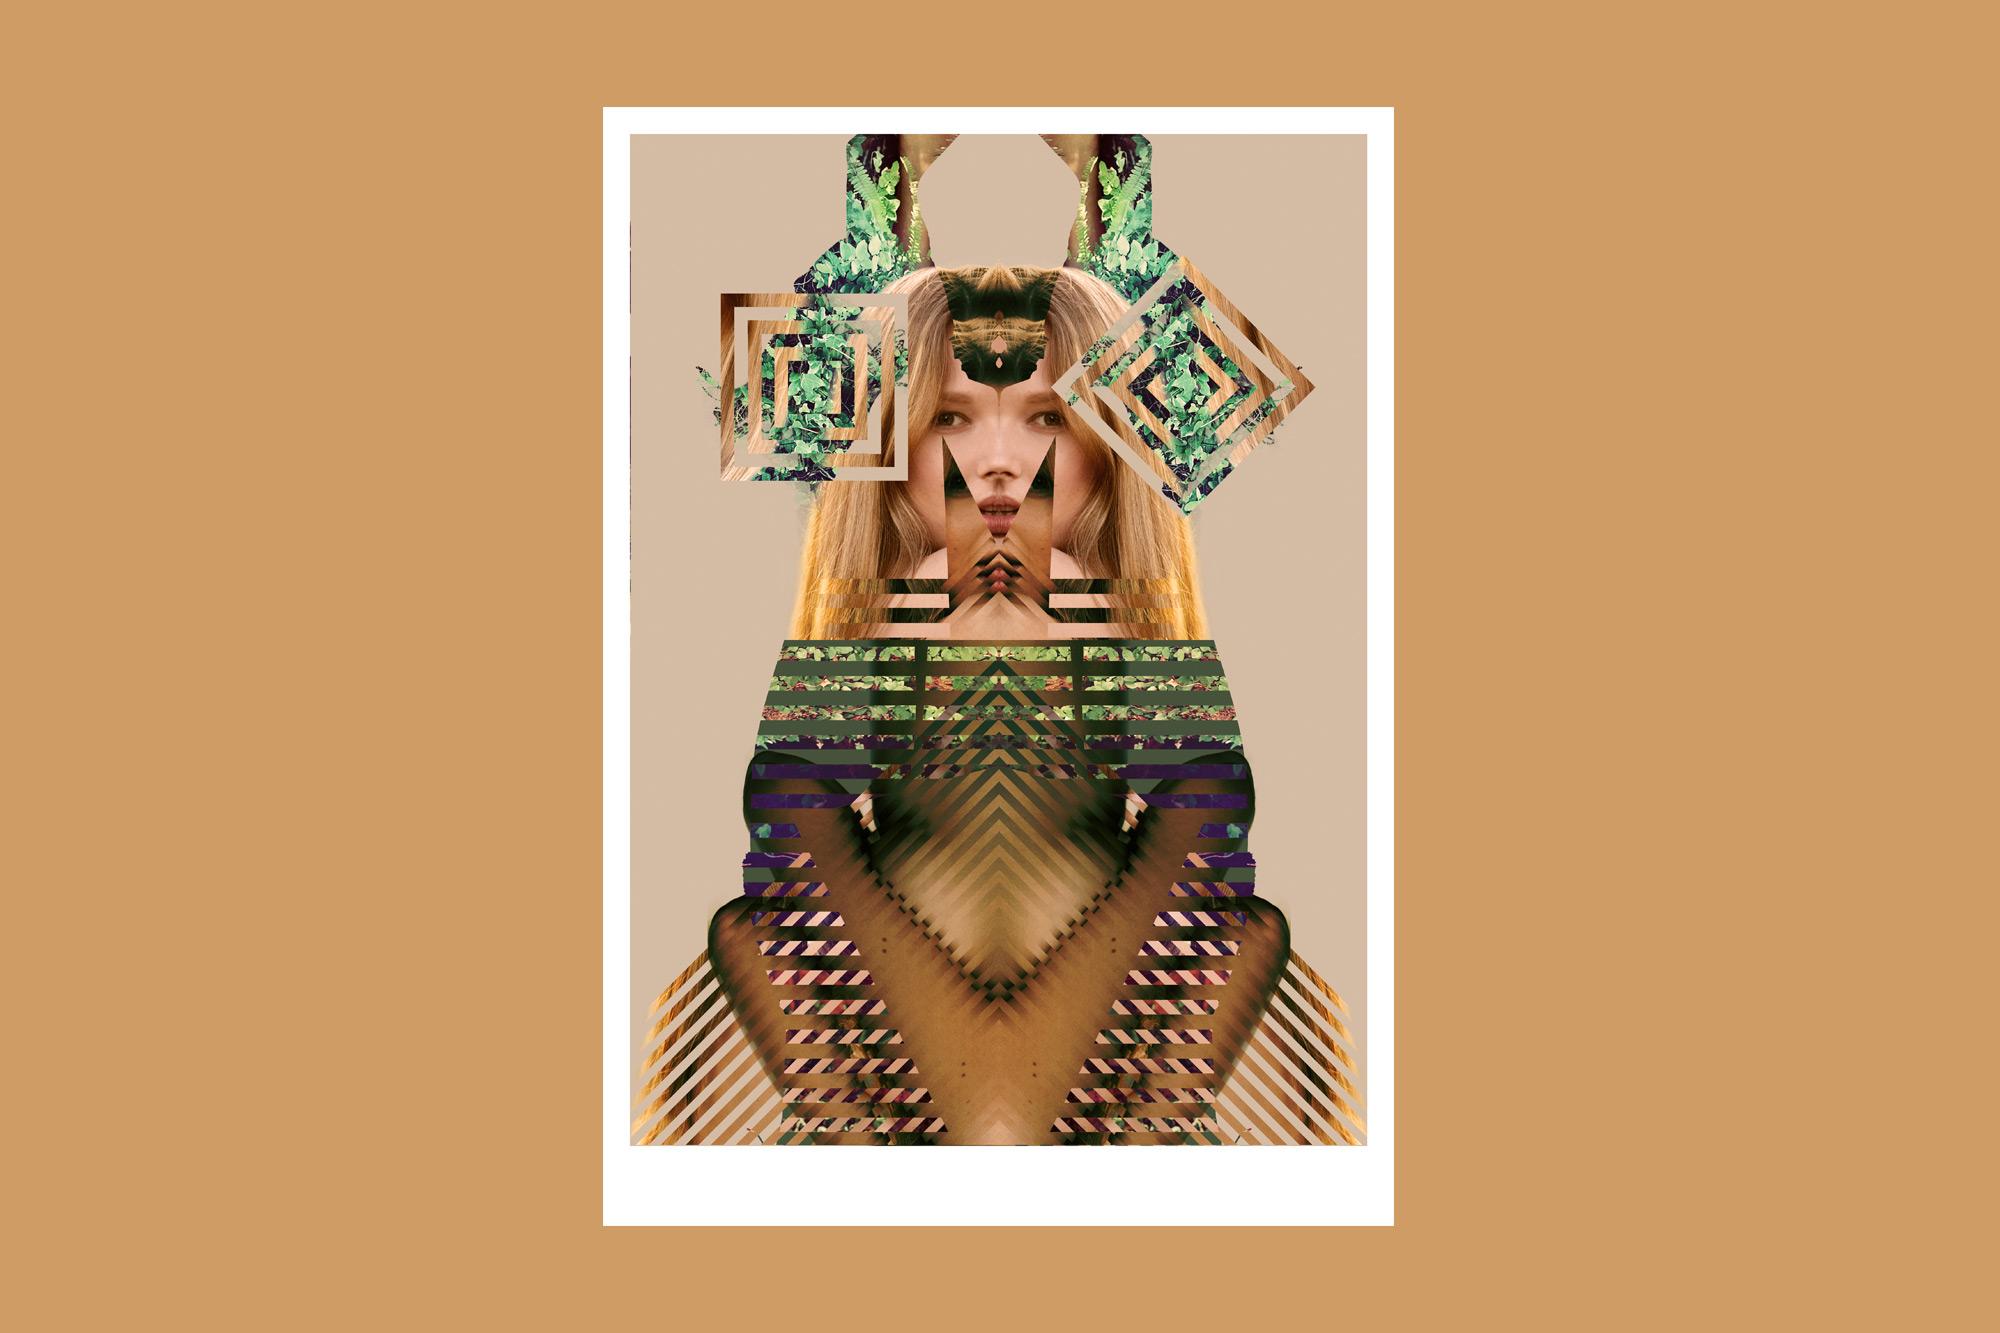 gpj-studio-visual-exploration-divided-series-03